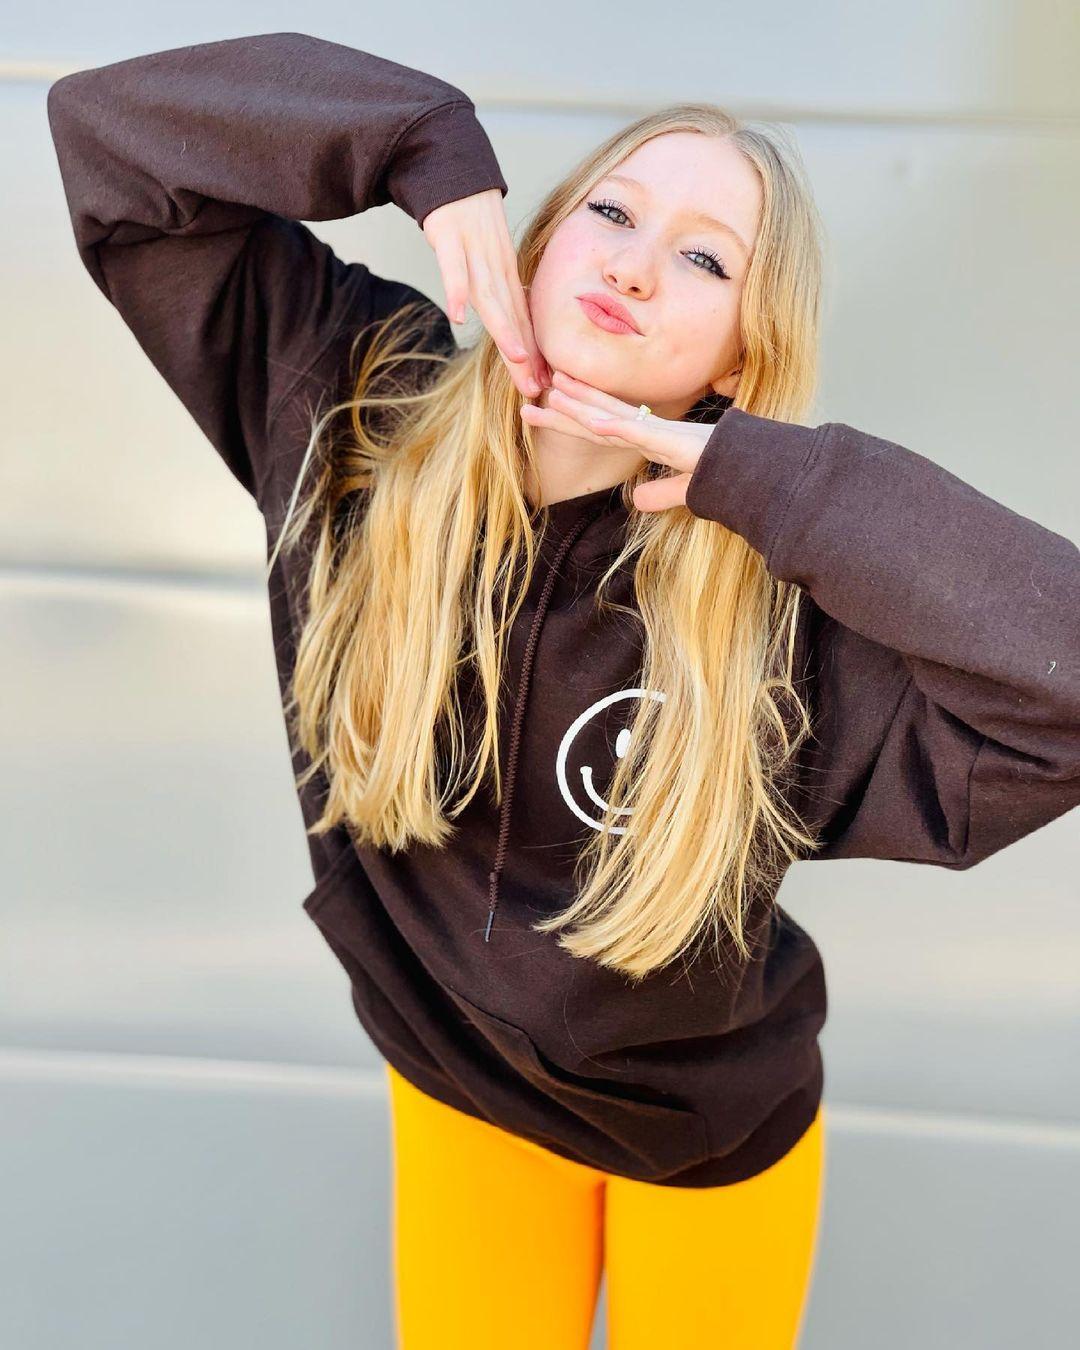 Abigail-Zoe-Lewis-Wallpapers-Insta-Fit-Bio-3